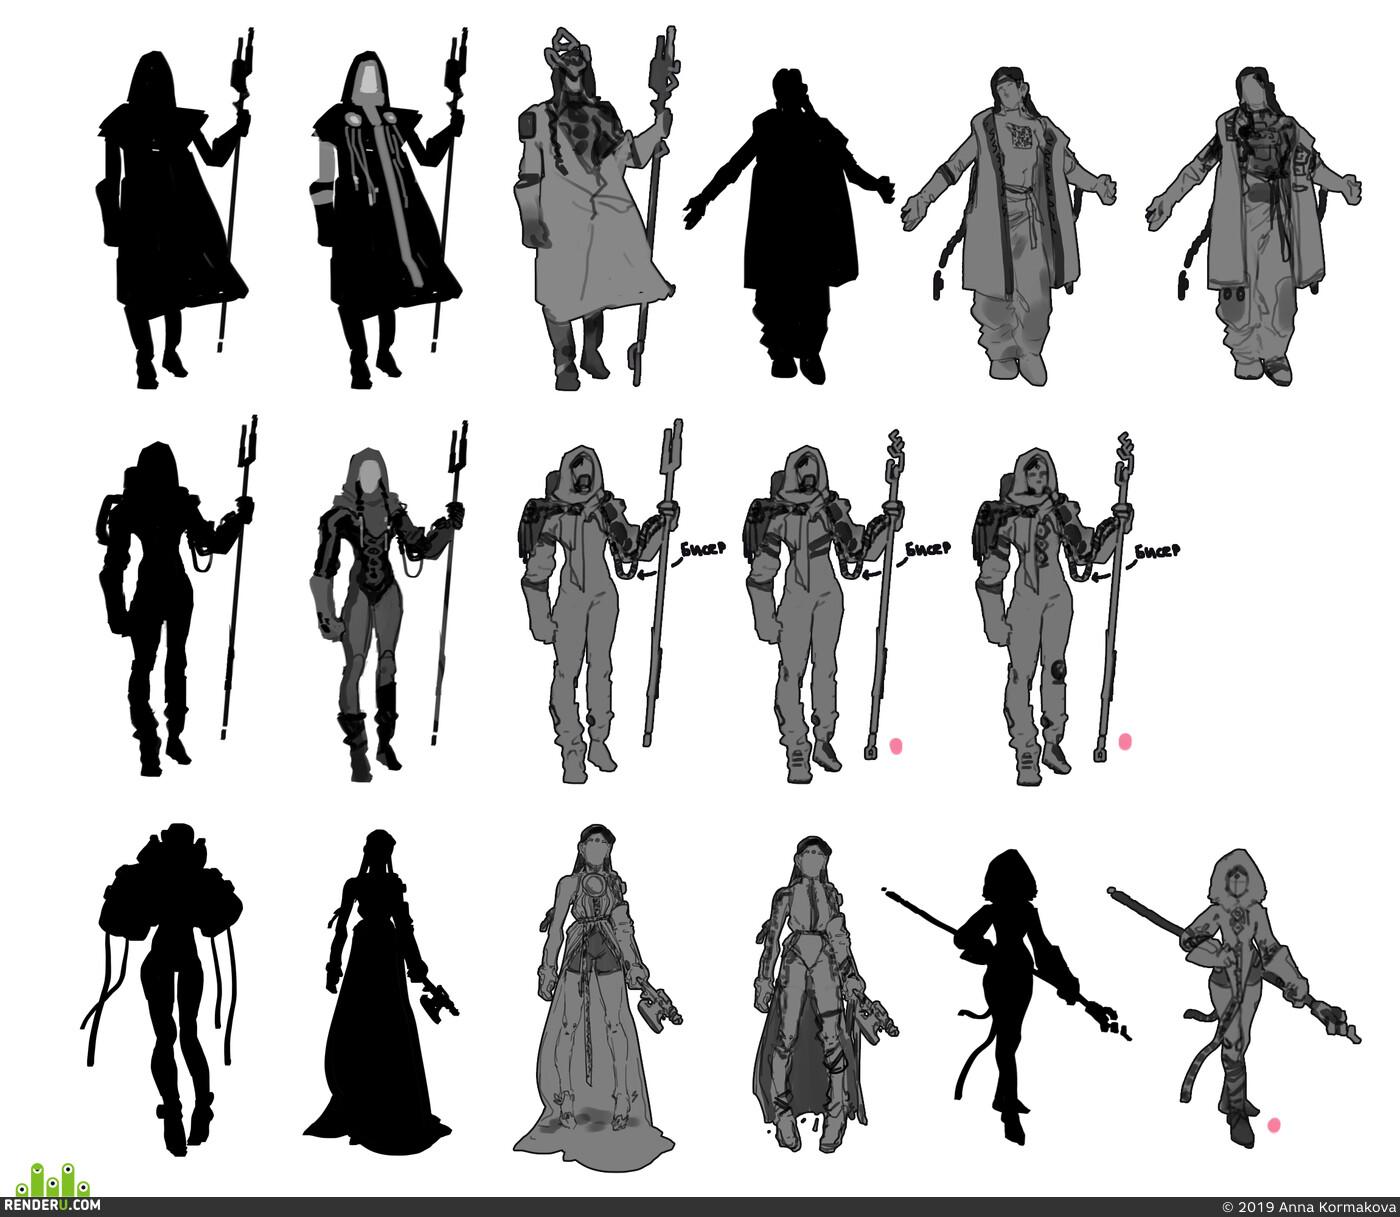 2D, gameart, Концепт-арт, Концепт Арт, концепт персонажа, киберпанк, ArtilleryFengCyberpunk, sci fi